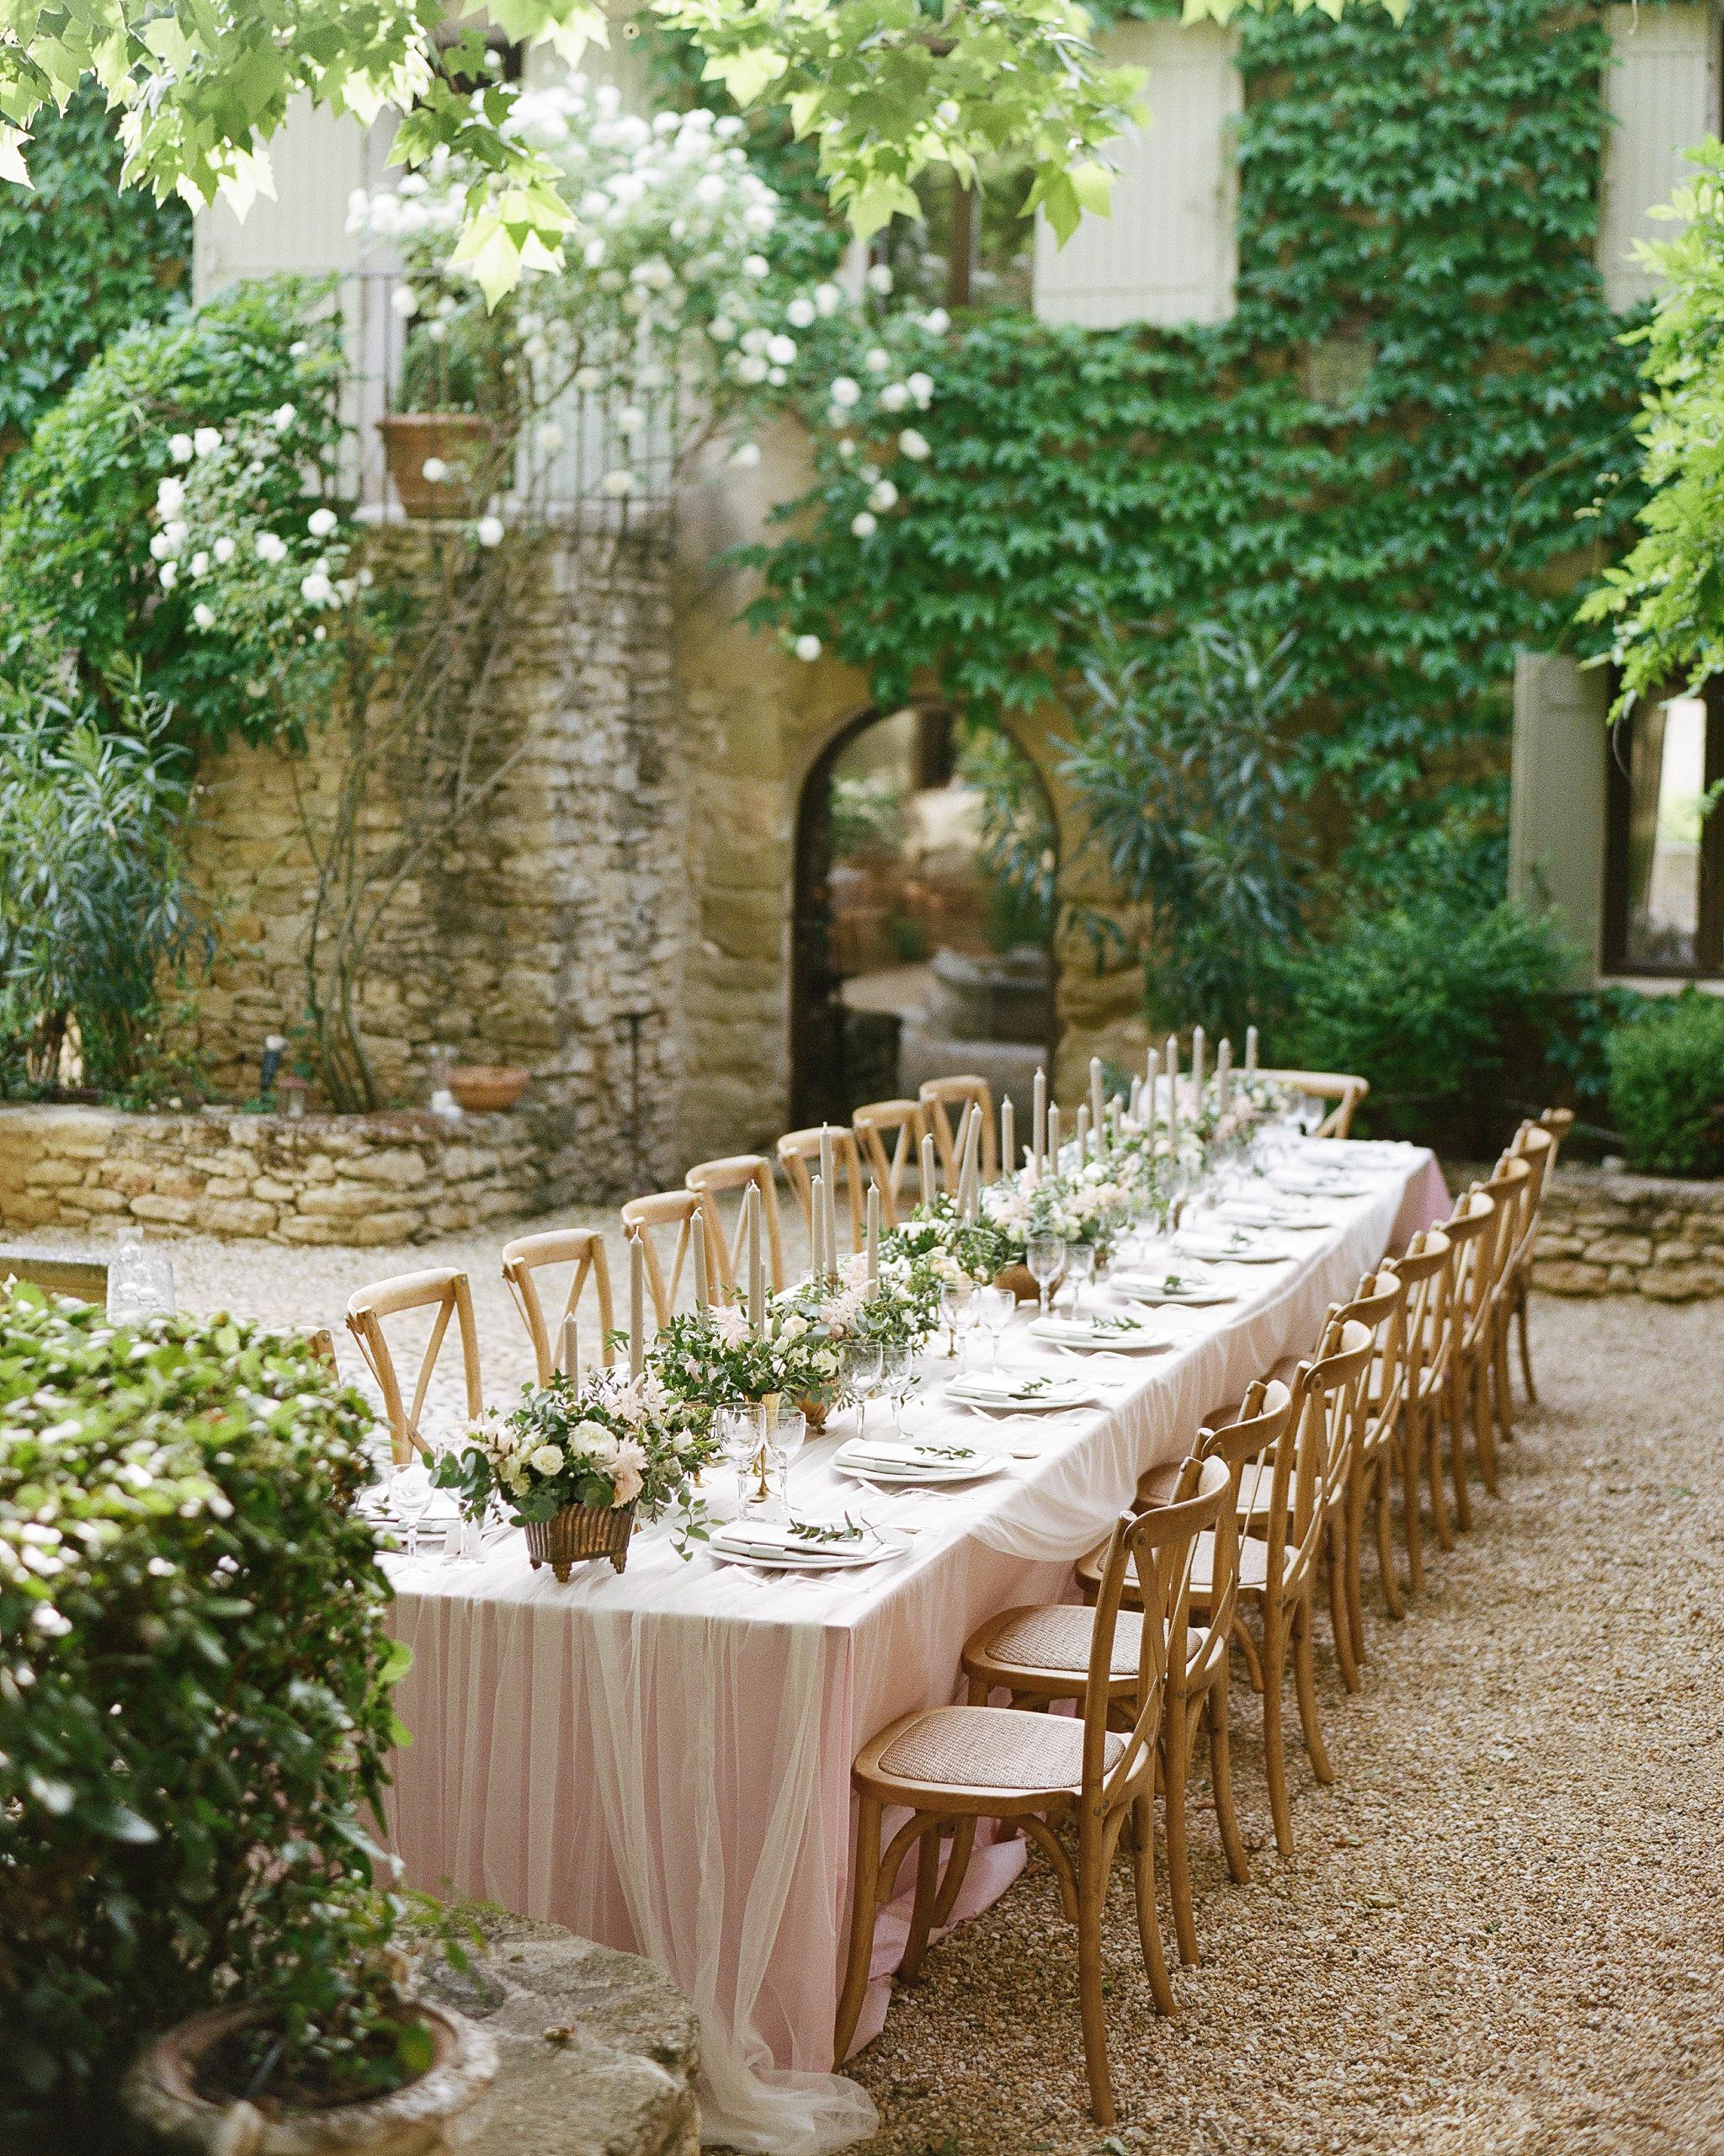 julie-chris-wedding-table-1397-s12649-0216.jpg